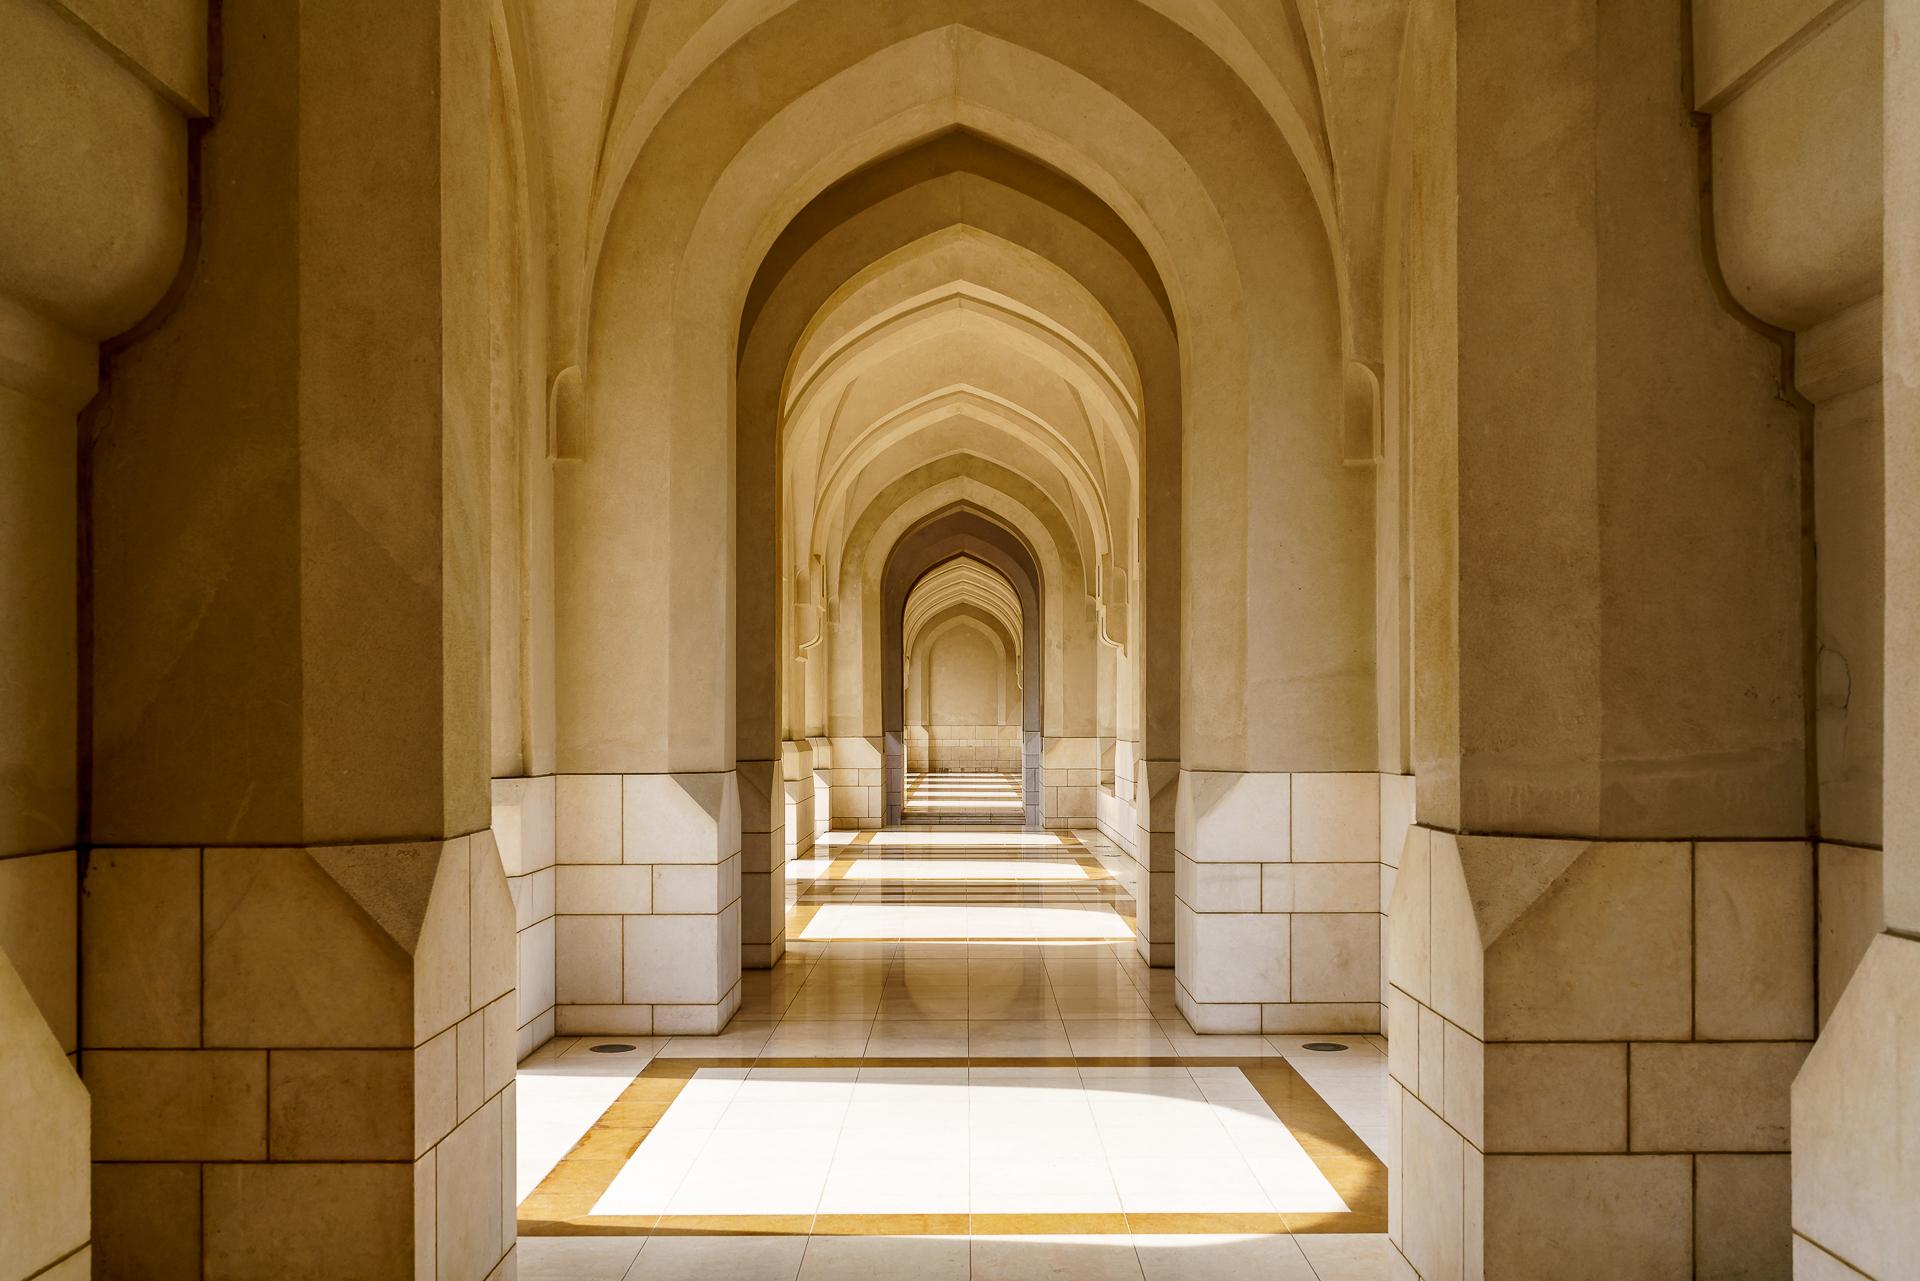 Muscat-Architektur-1